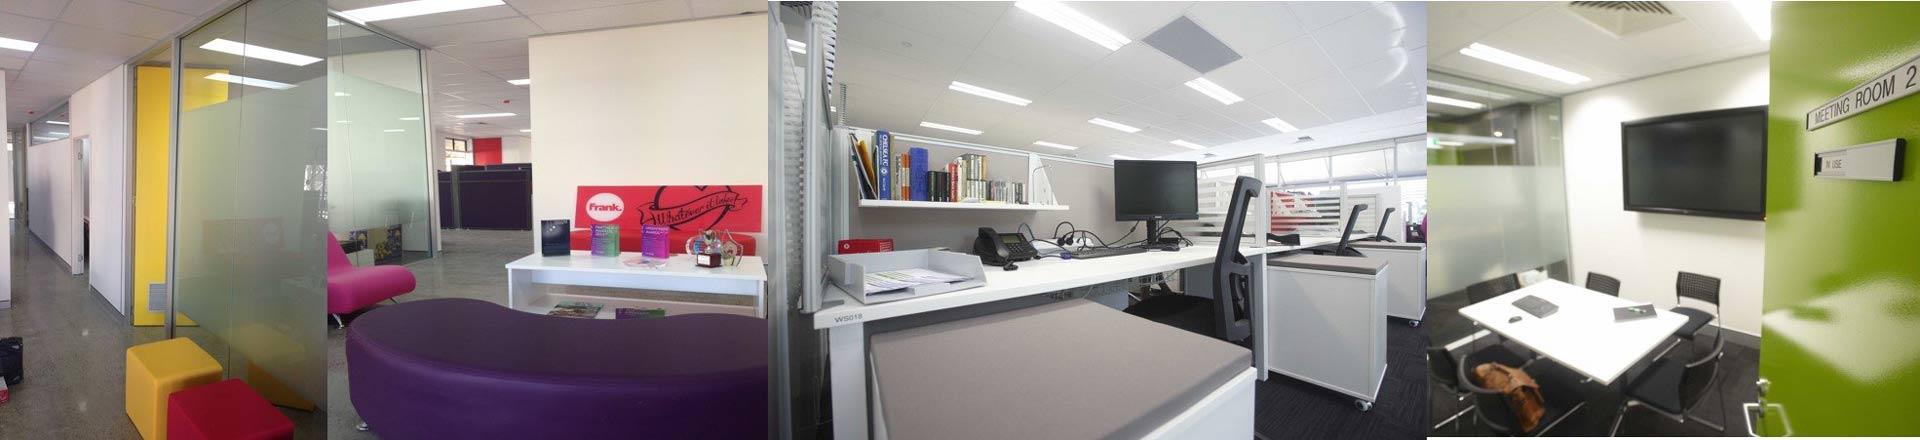 office-fitouts-brisbane-img-01